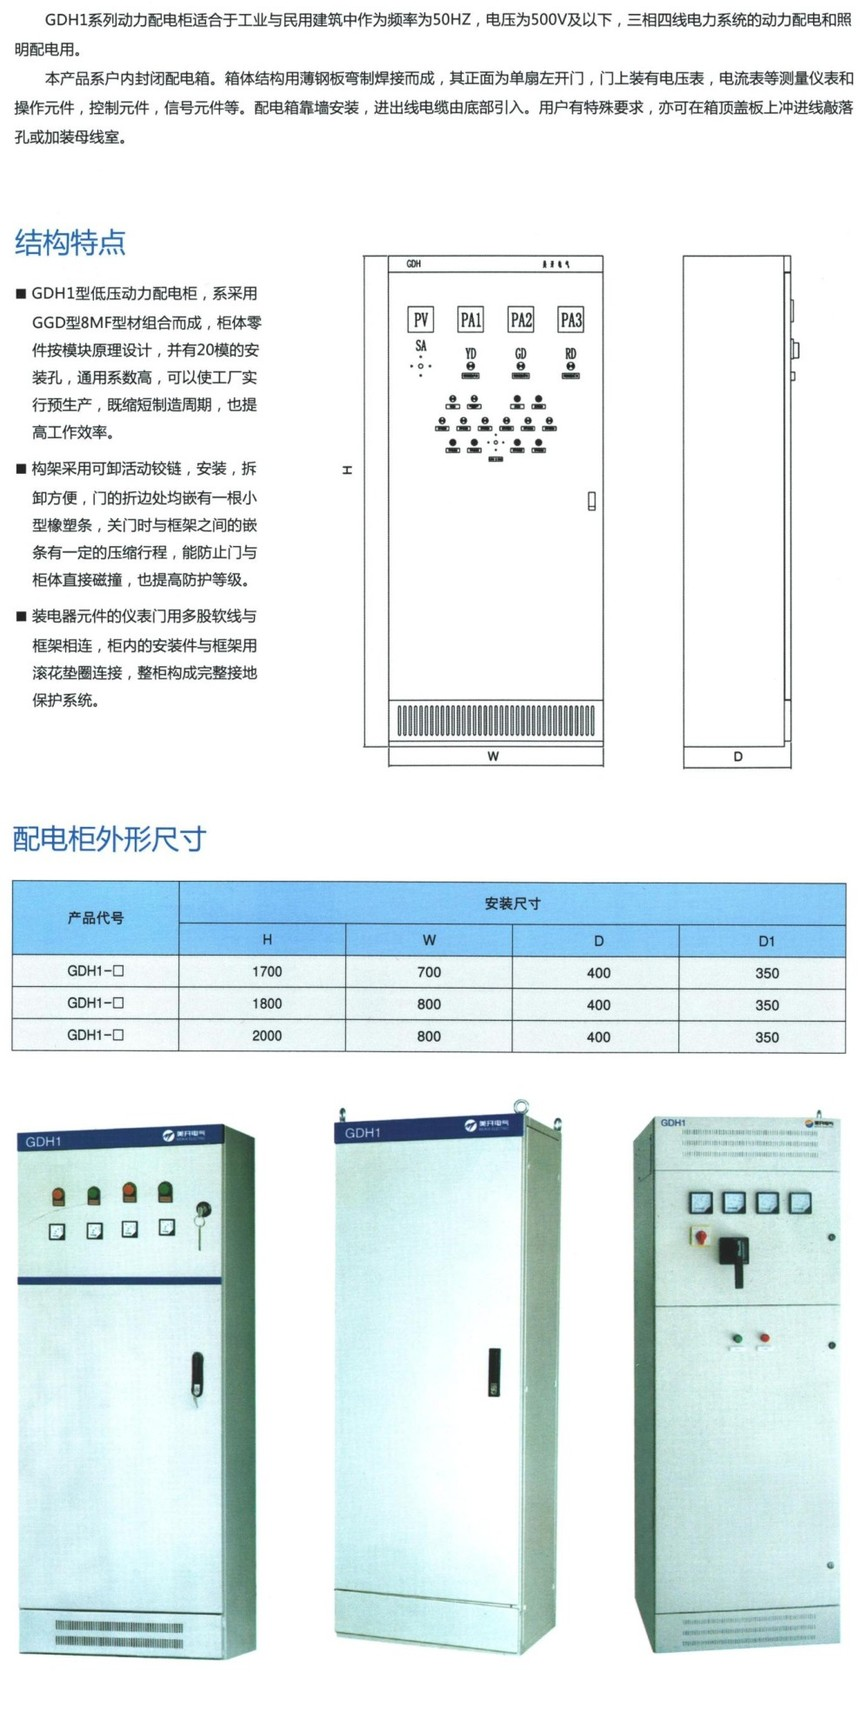 GDH1系列能源配电柜概况页.jpg